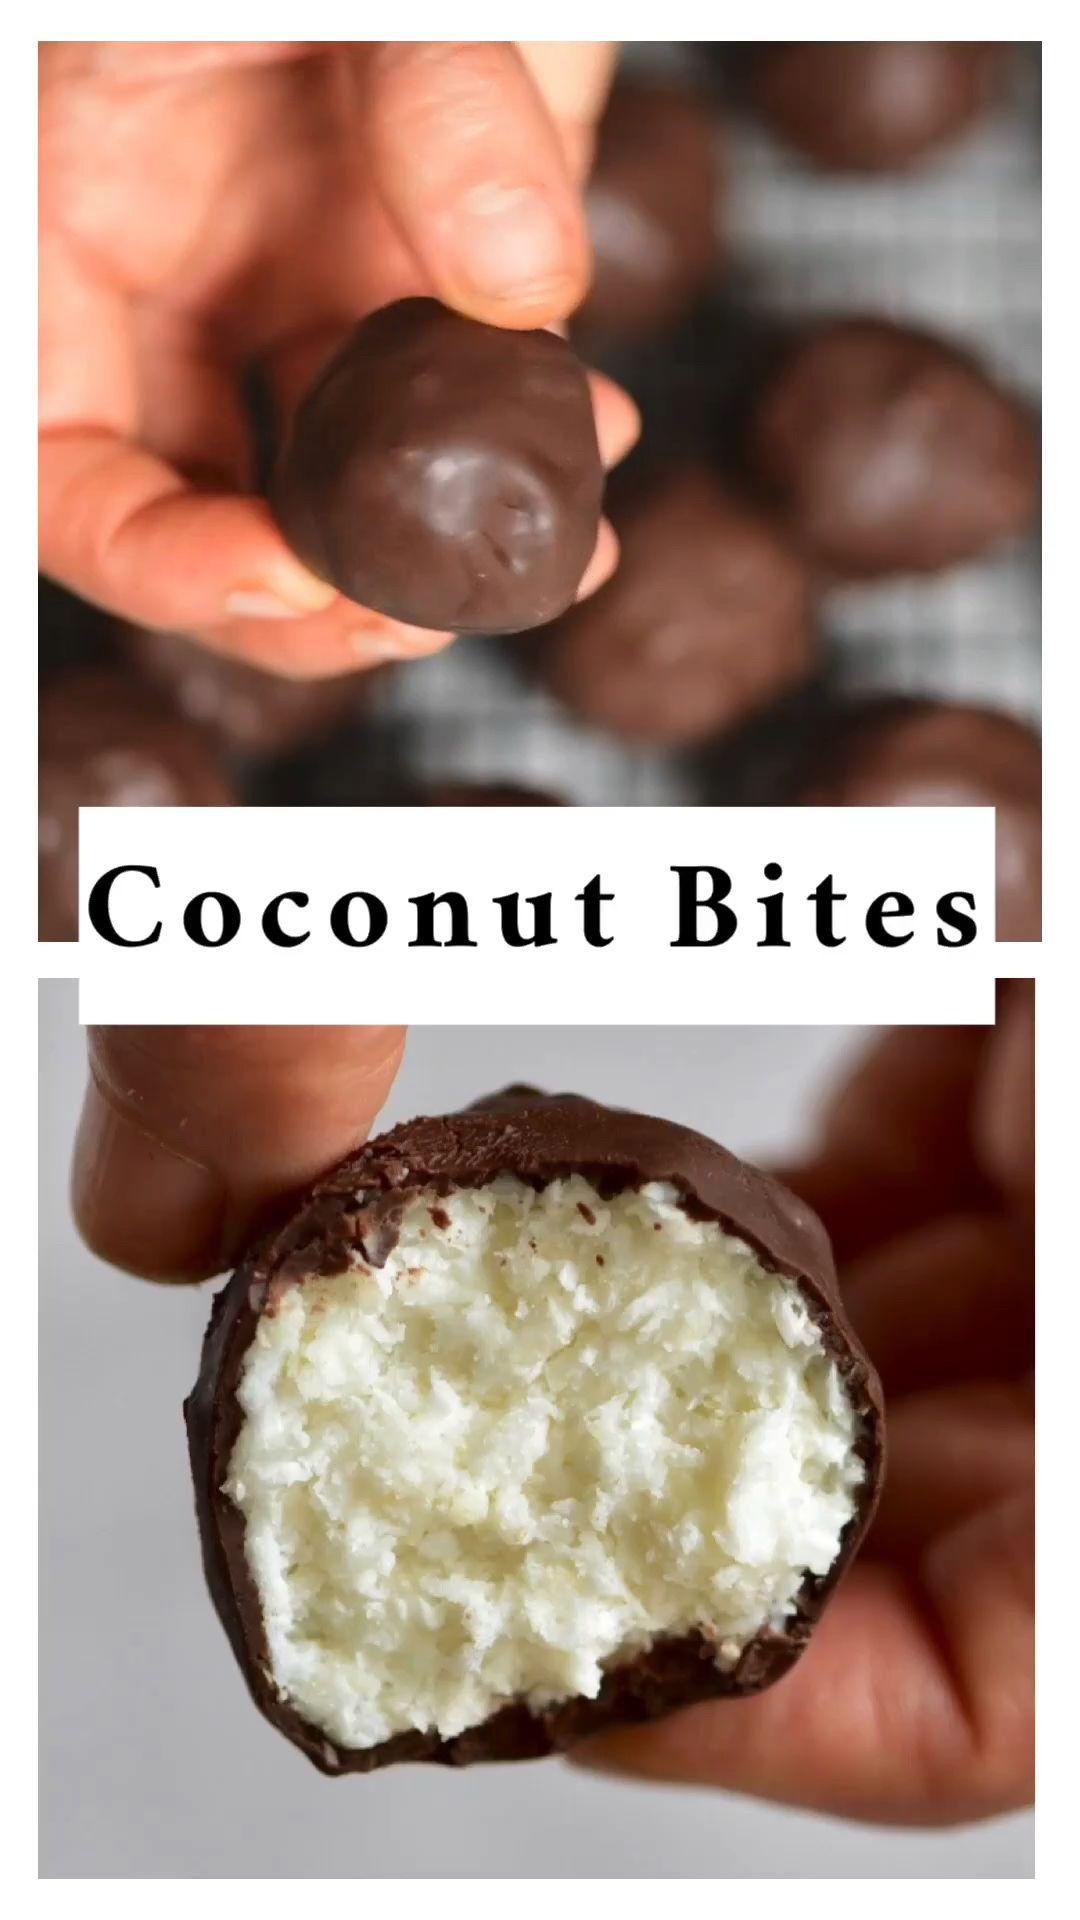 Tasty Keto Coconut Bites (Low-Carb) Recipe.